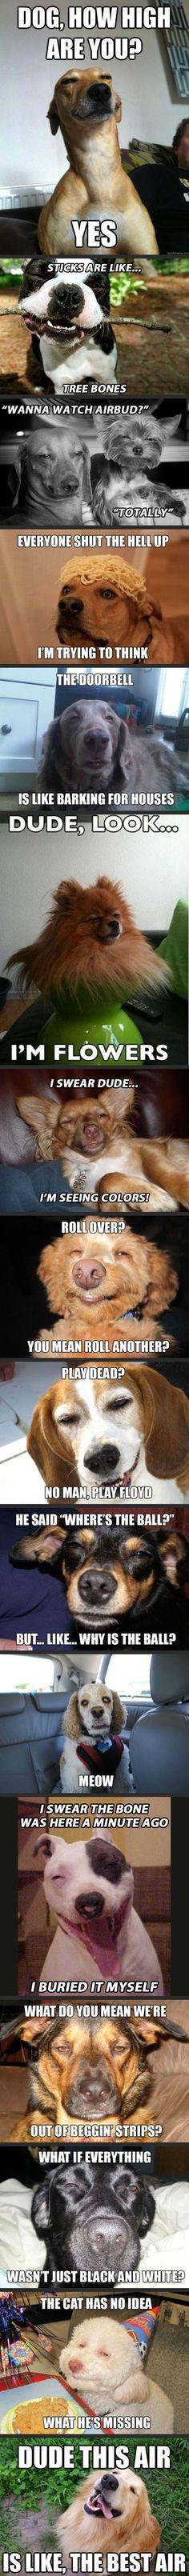 Hilarious dogs on weed www.bestfunnyjokes4u.com/